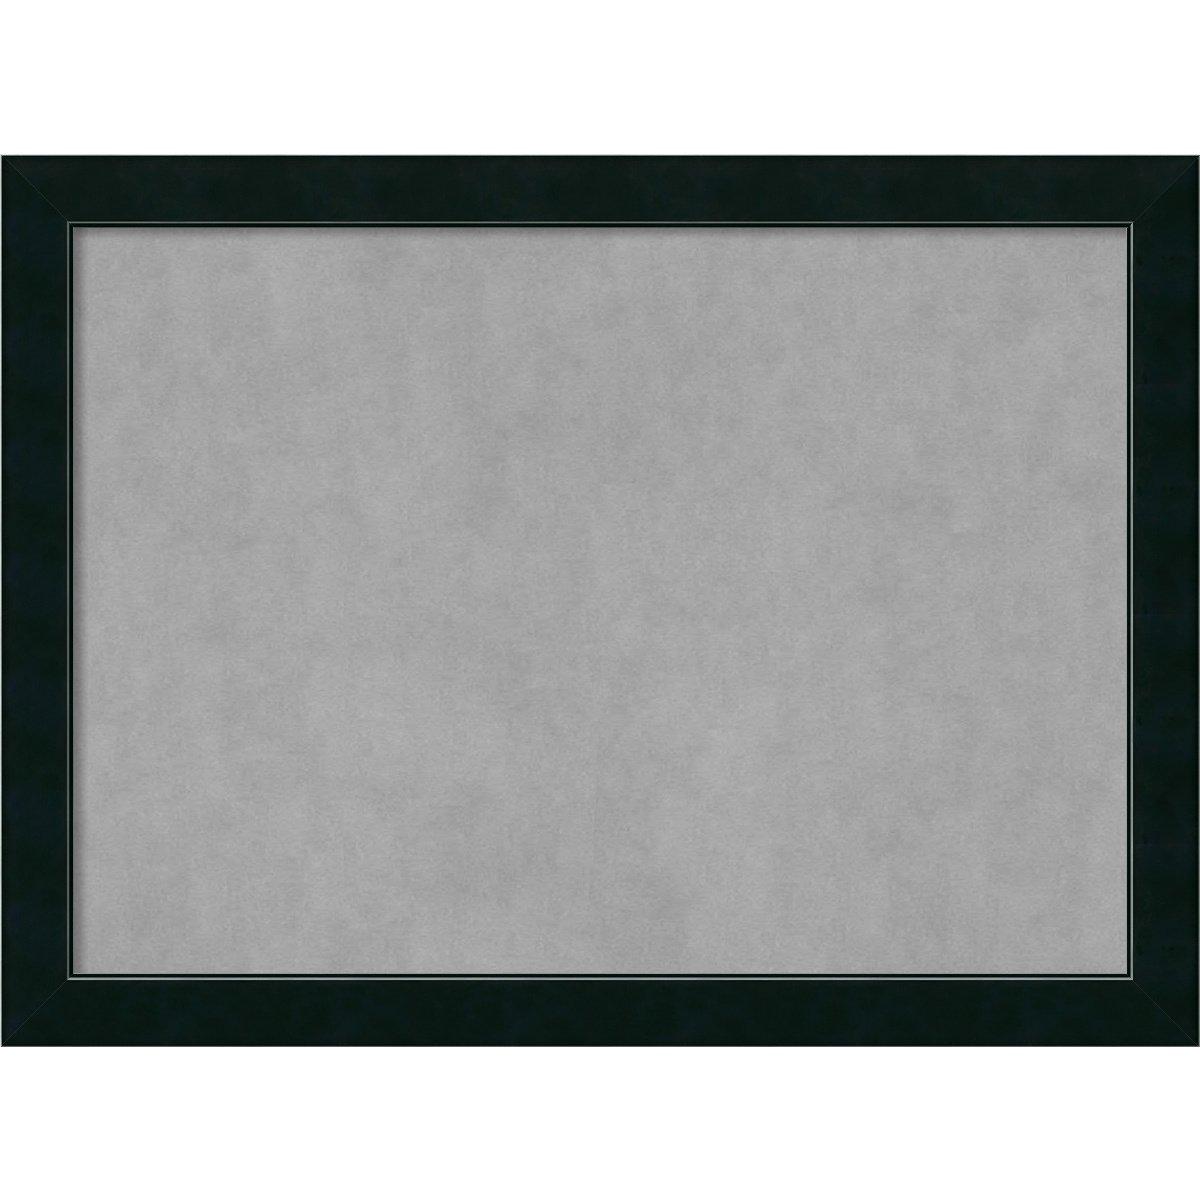 Amanti Art DSW3979219 Framed Magnetic Board, Large, Corvino Black